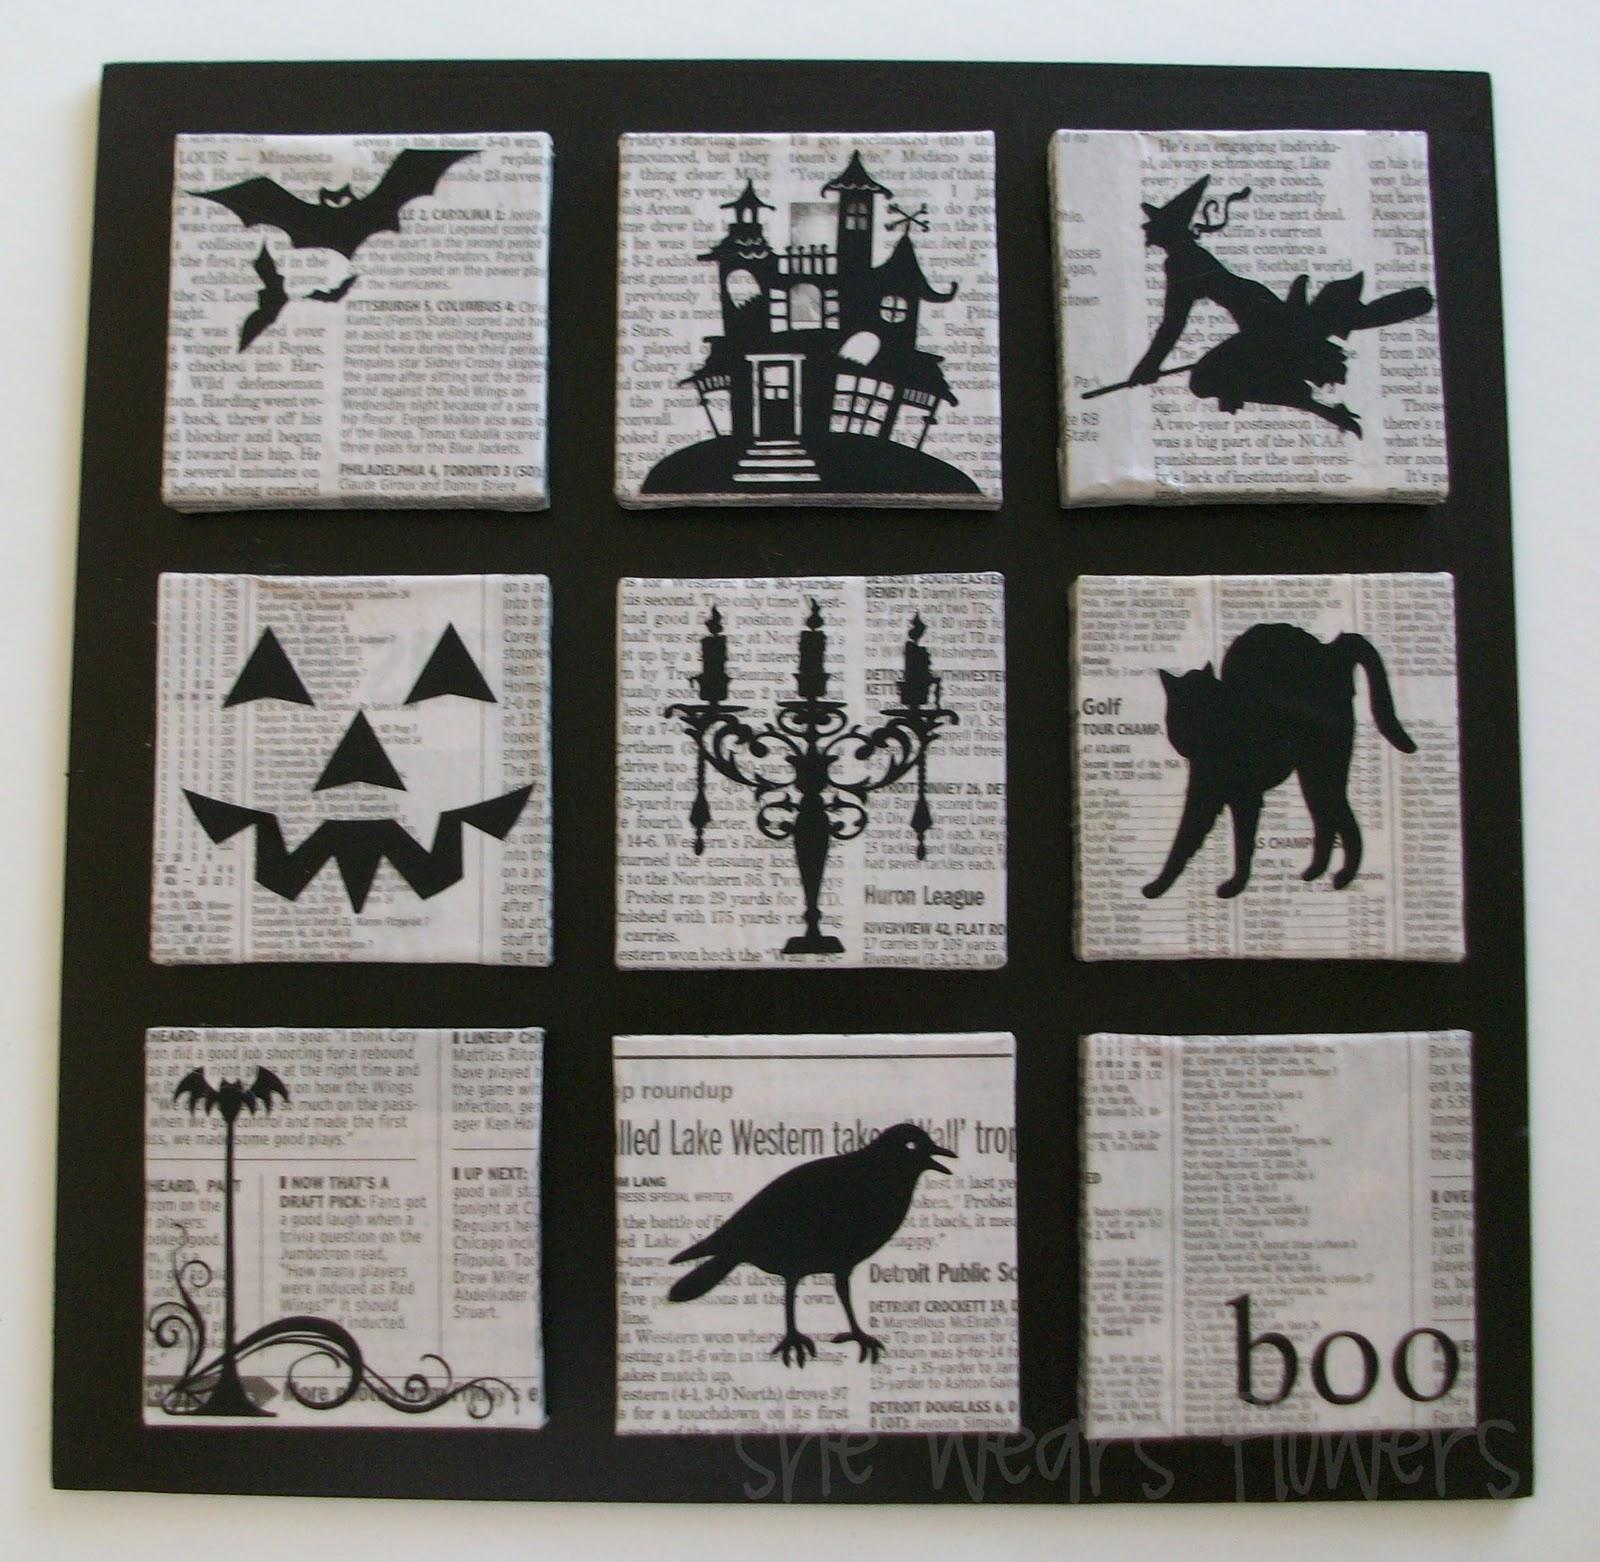 http://i0.wp.com/3.bp.blogspot.com/_IUuOmI9OSJo/TKnah3HByWI/AAAAAAAABVg/h_ZeQwEywOE/s1600/Halloween+Canvas9.jpg?resize=572%2C559